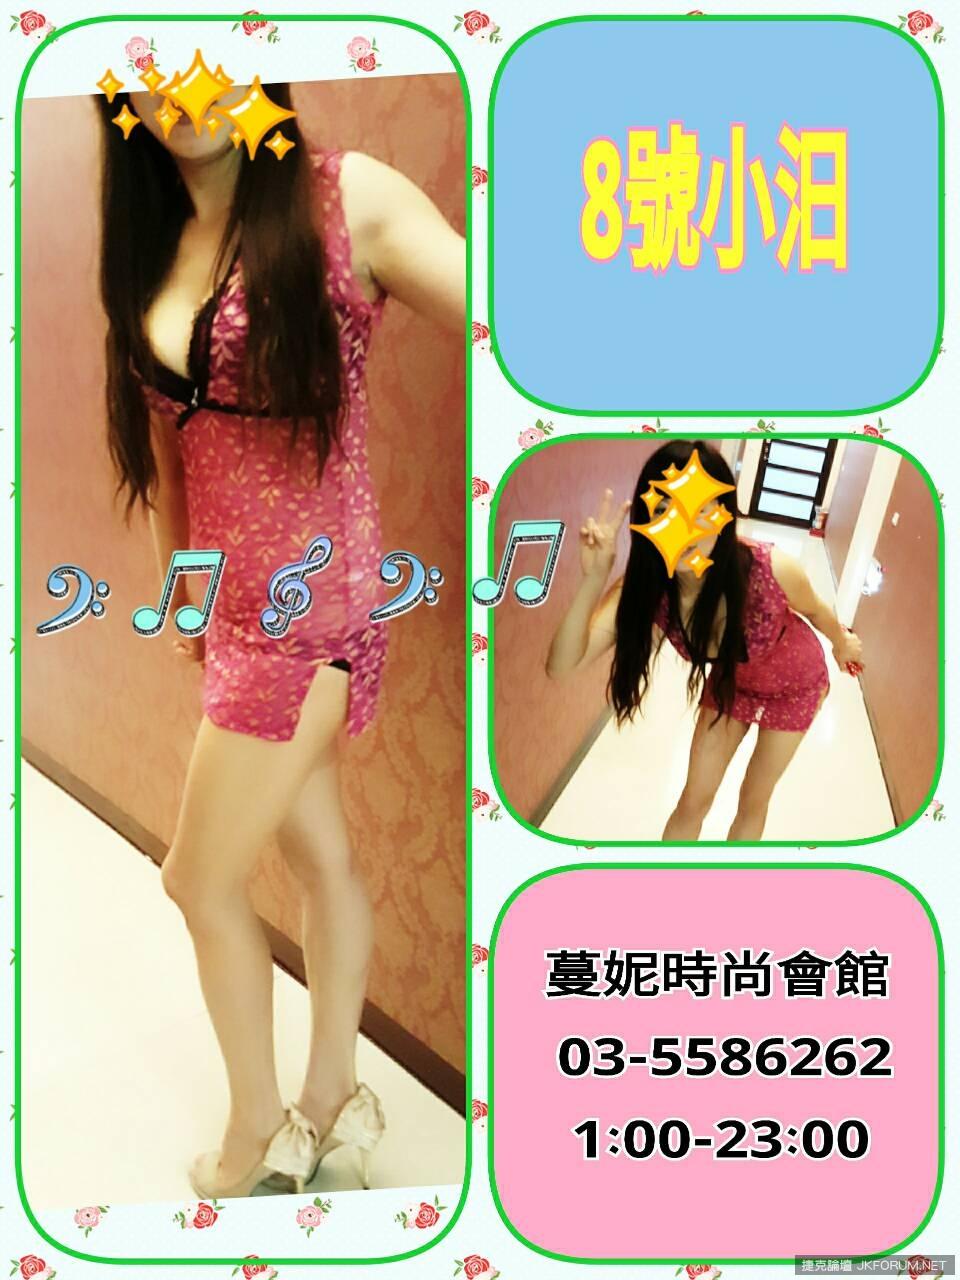 1233341d70tly5t1rcppyt.jpg